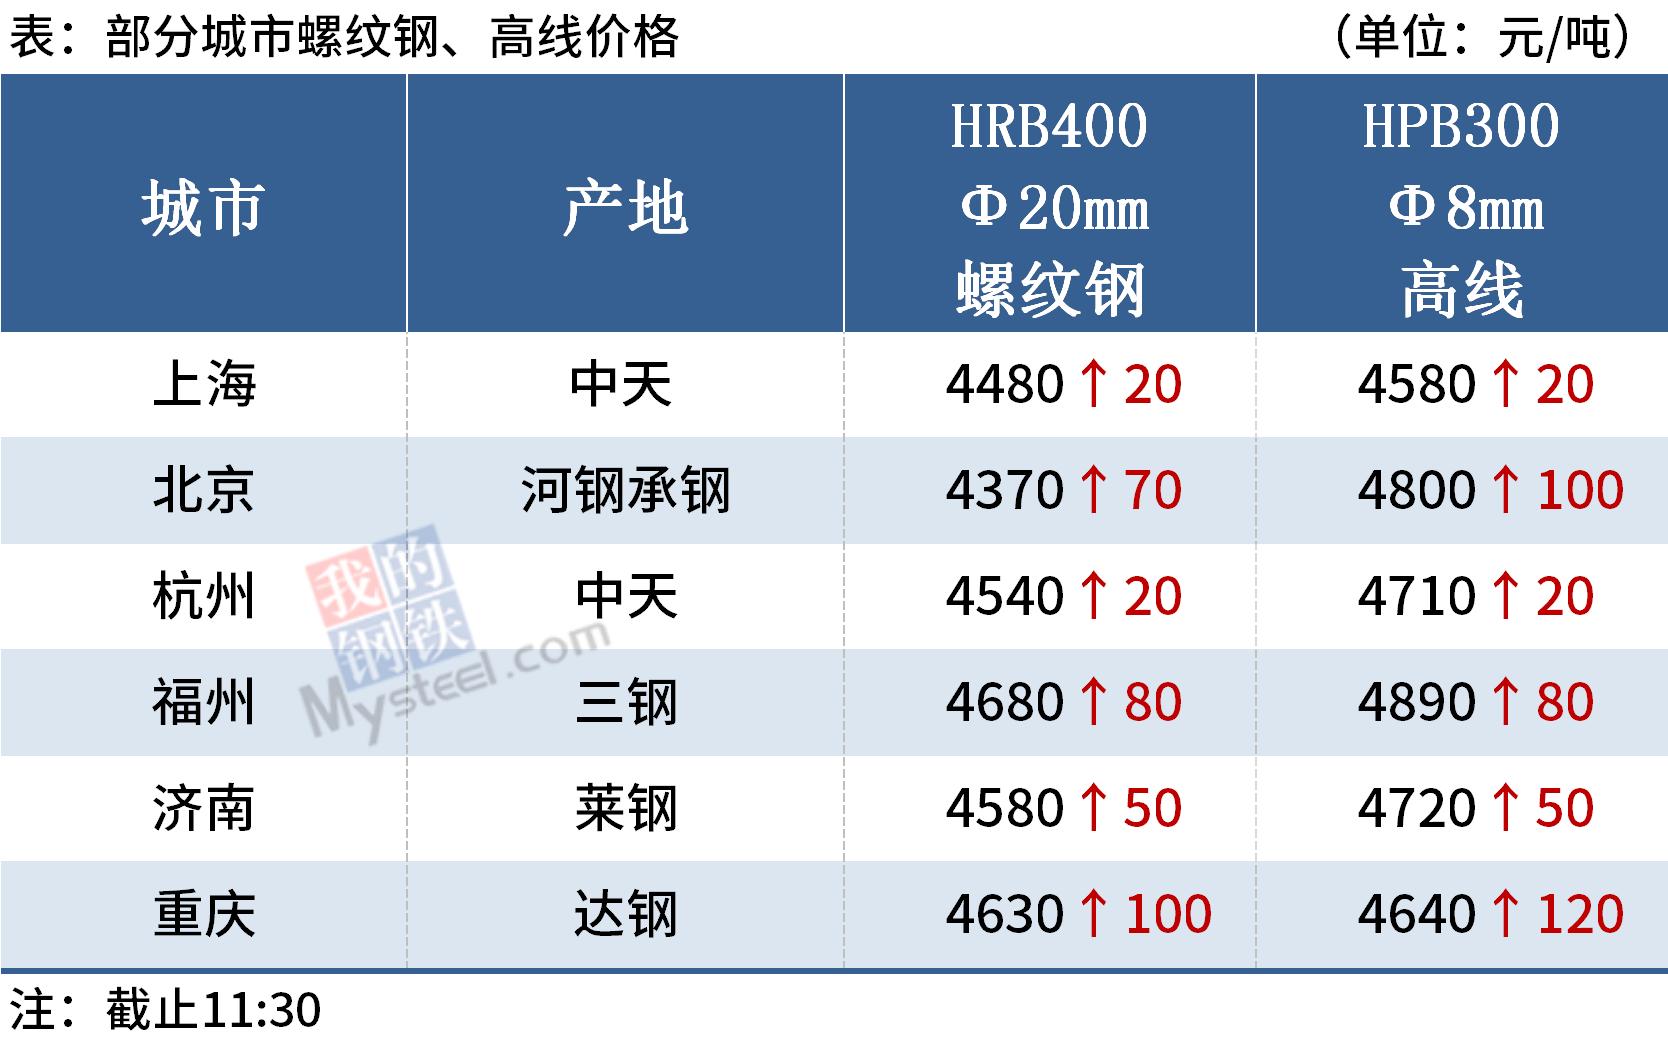 Mysteel午报:钢价普遍上涨,河北昌黎钢坯上调60